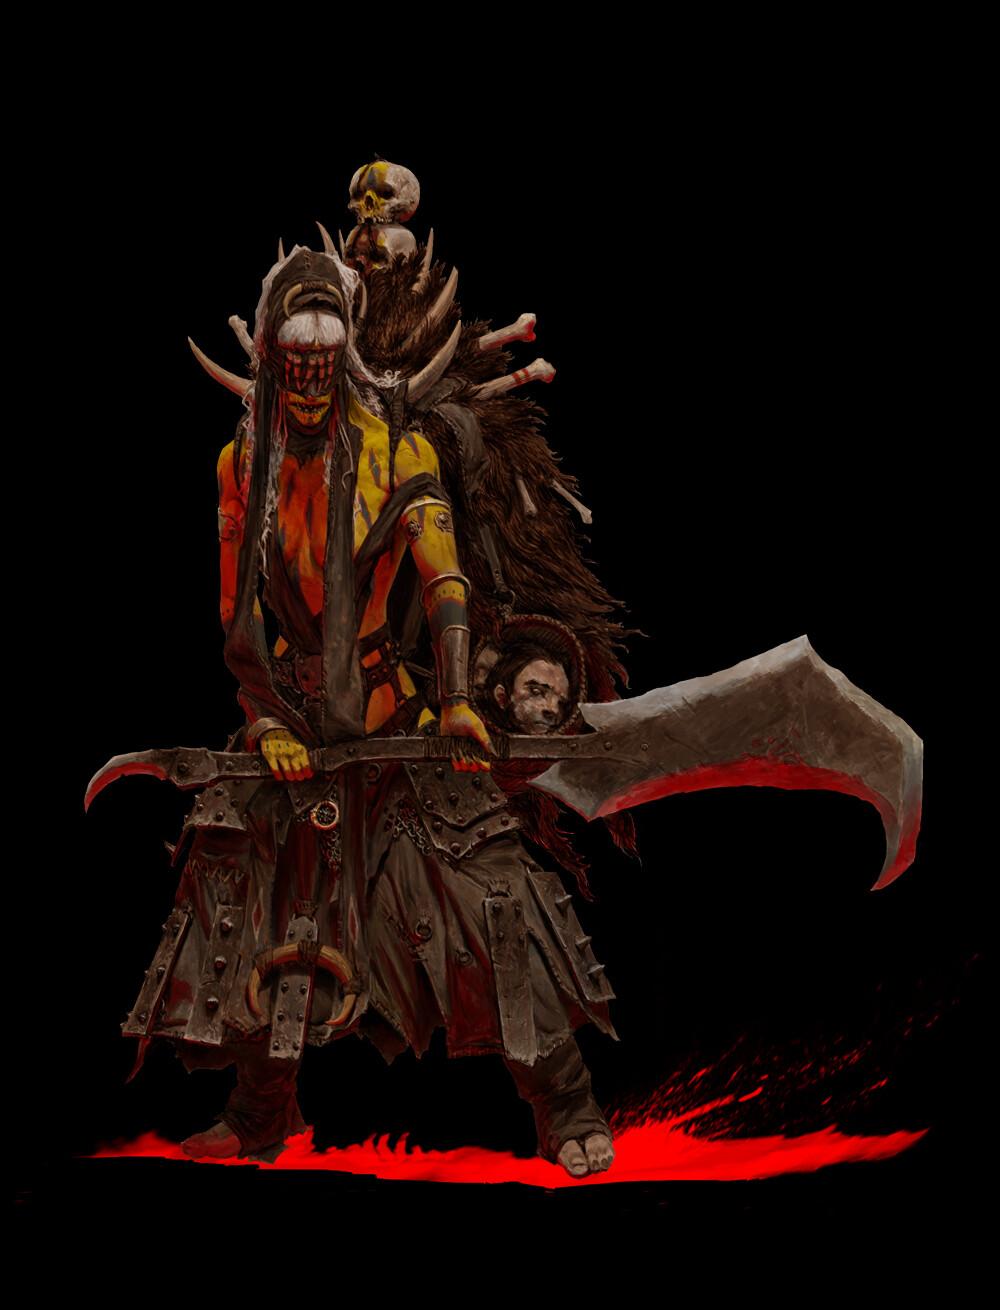 Adrian smith tribe 4 shaman coloured